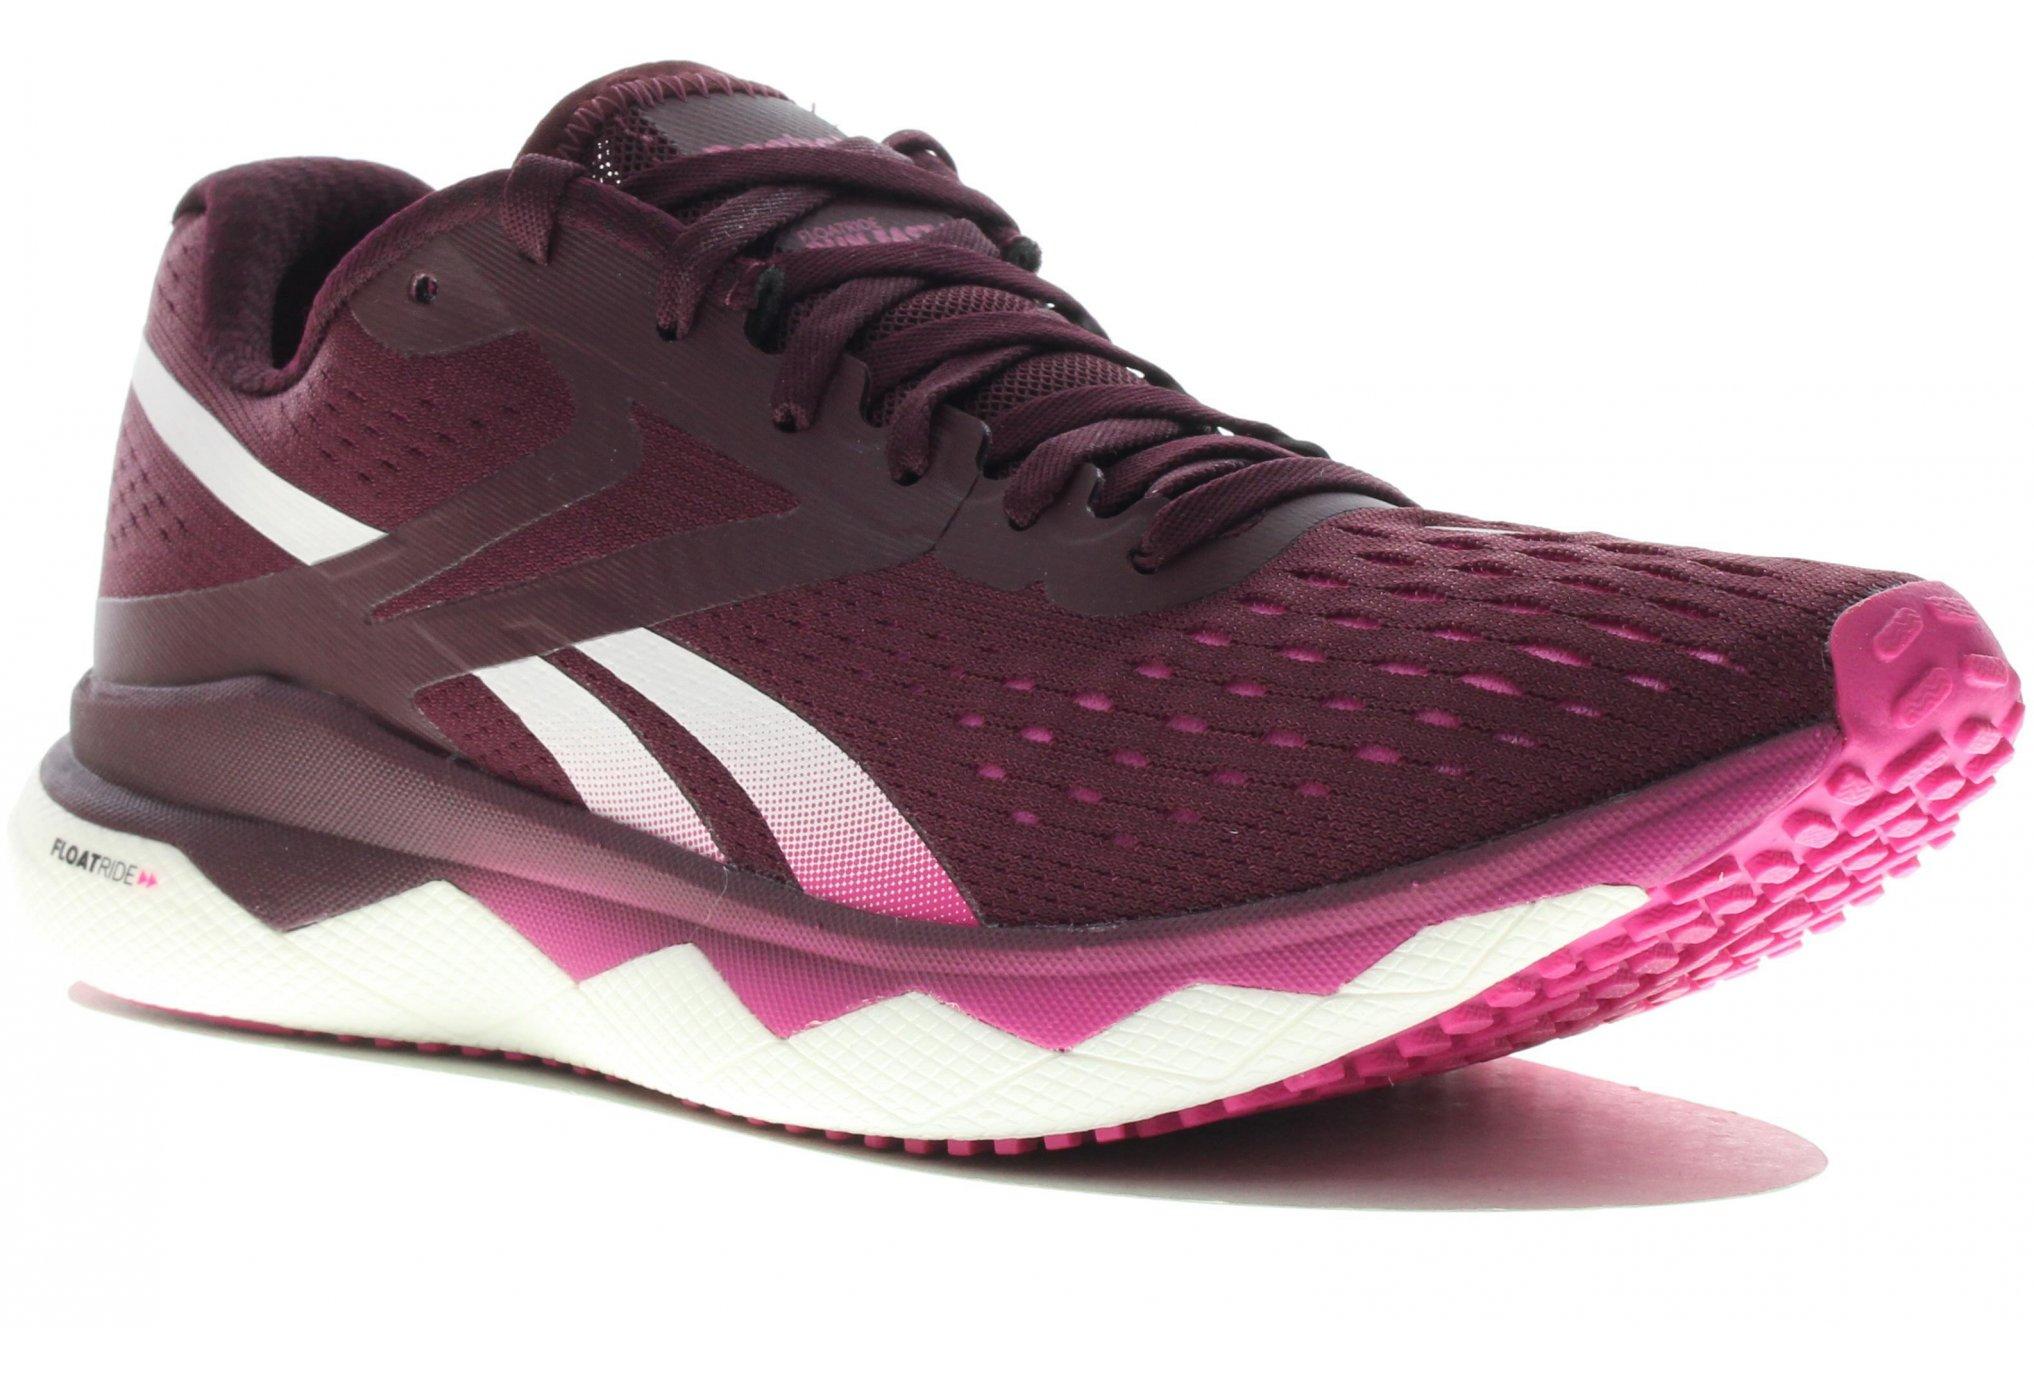 Reebok Floatride Run Fast 2.0 Chaussures running femme